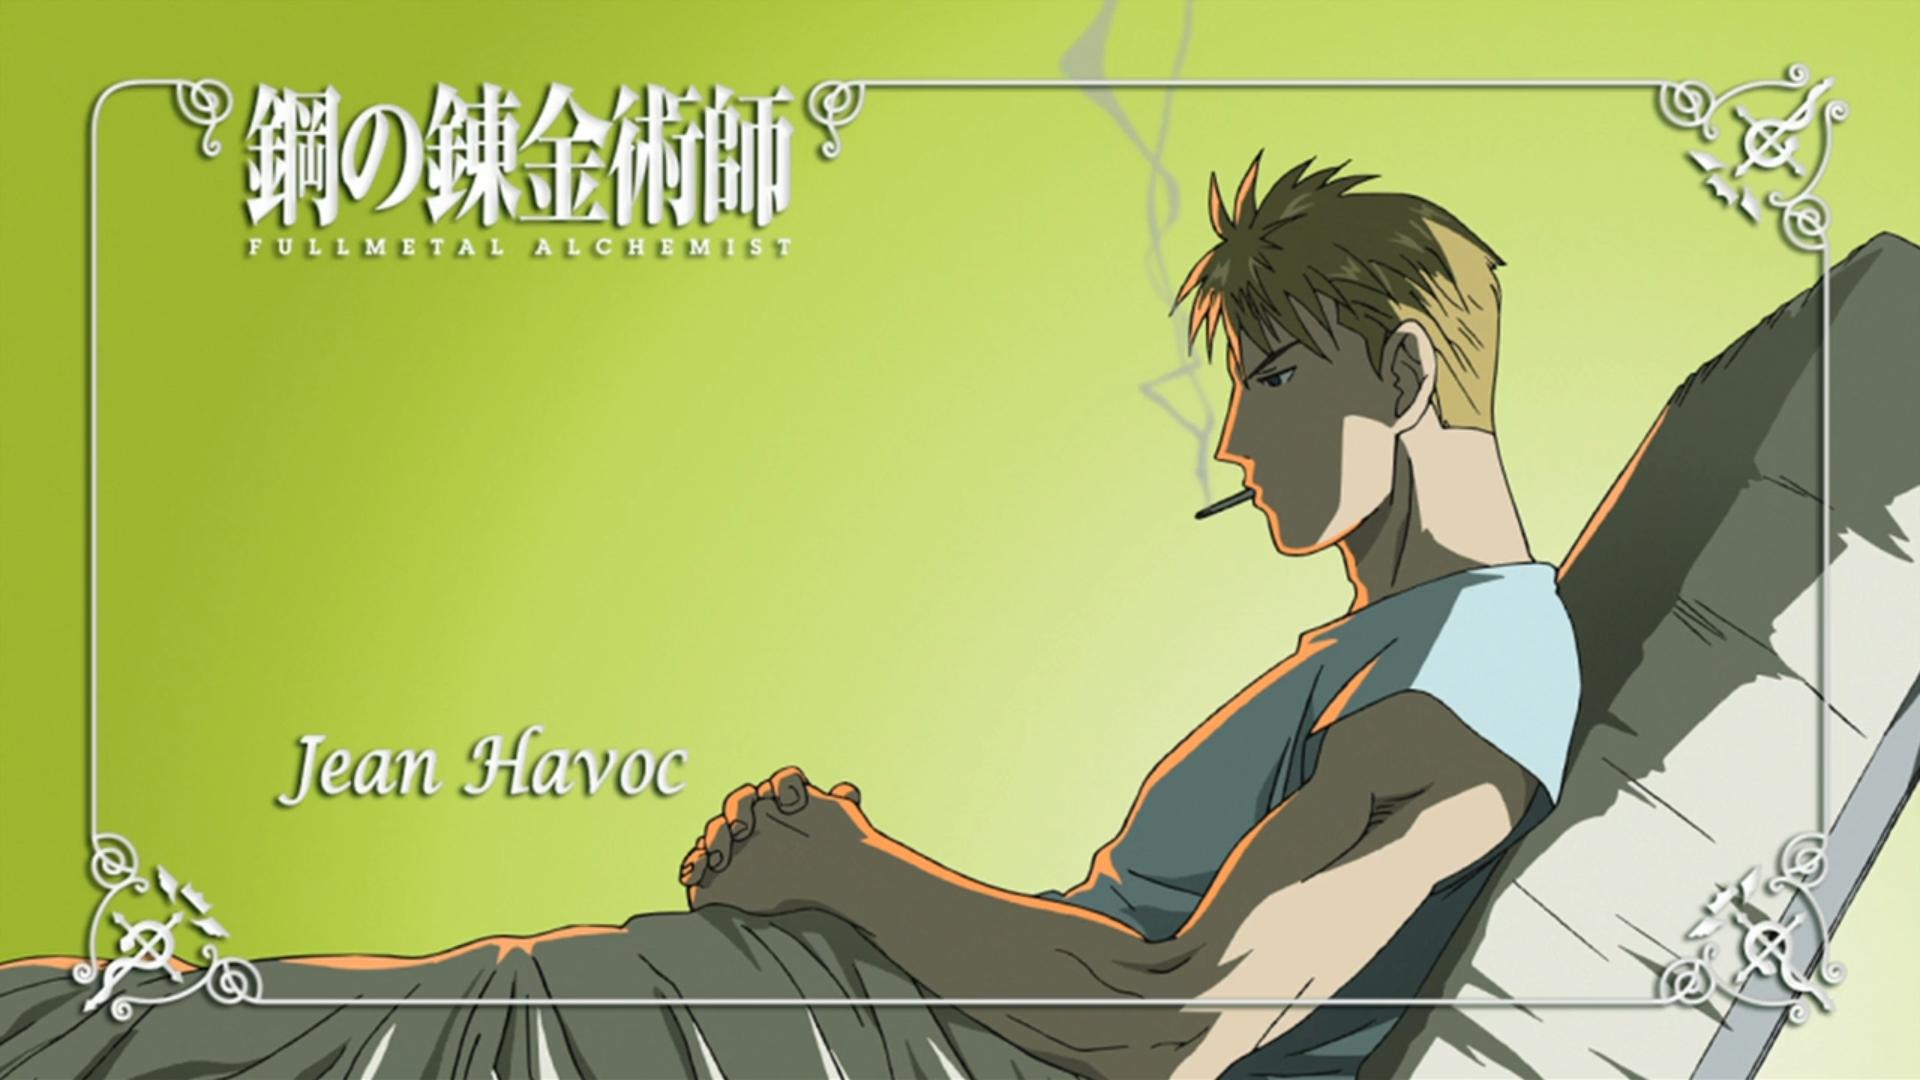 Wallpaper : illustration, anime, cartoon, comics, brand, Fullmetal Alchemist Brotherhood ...